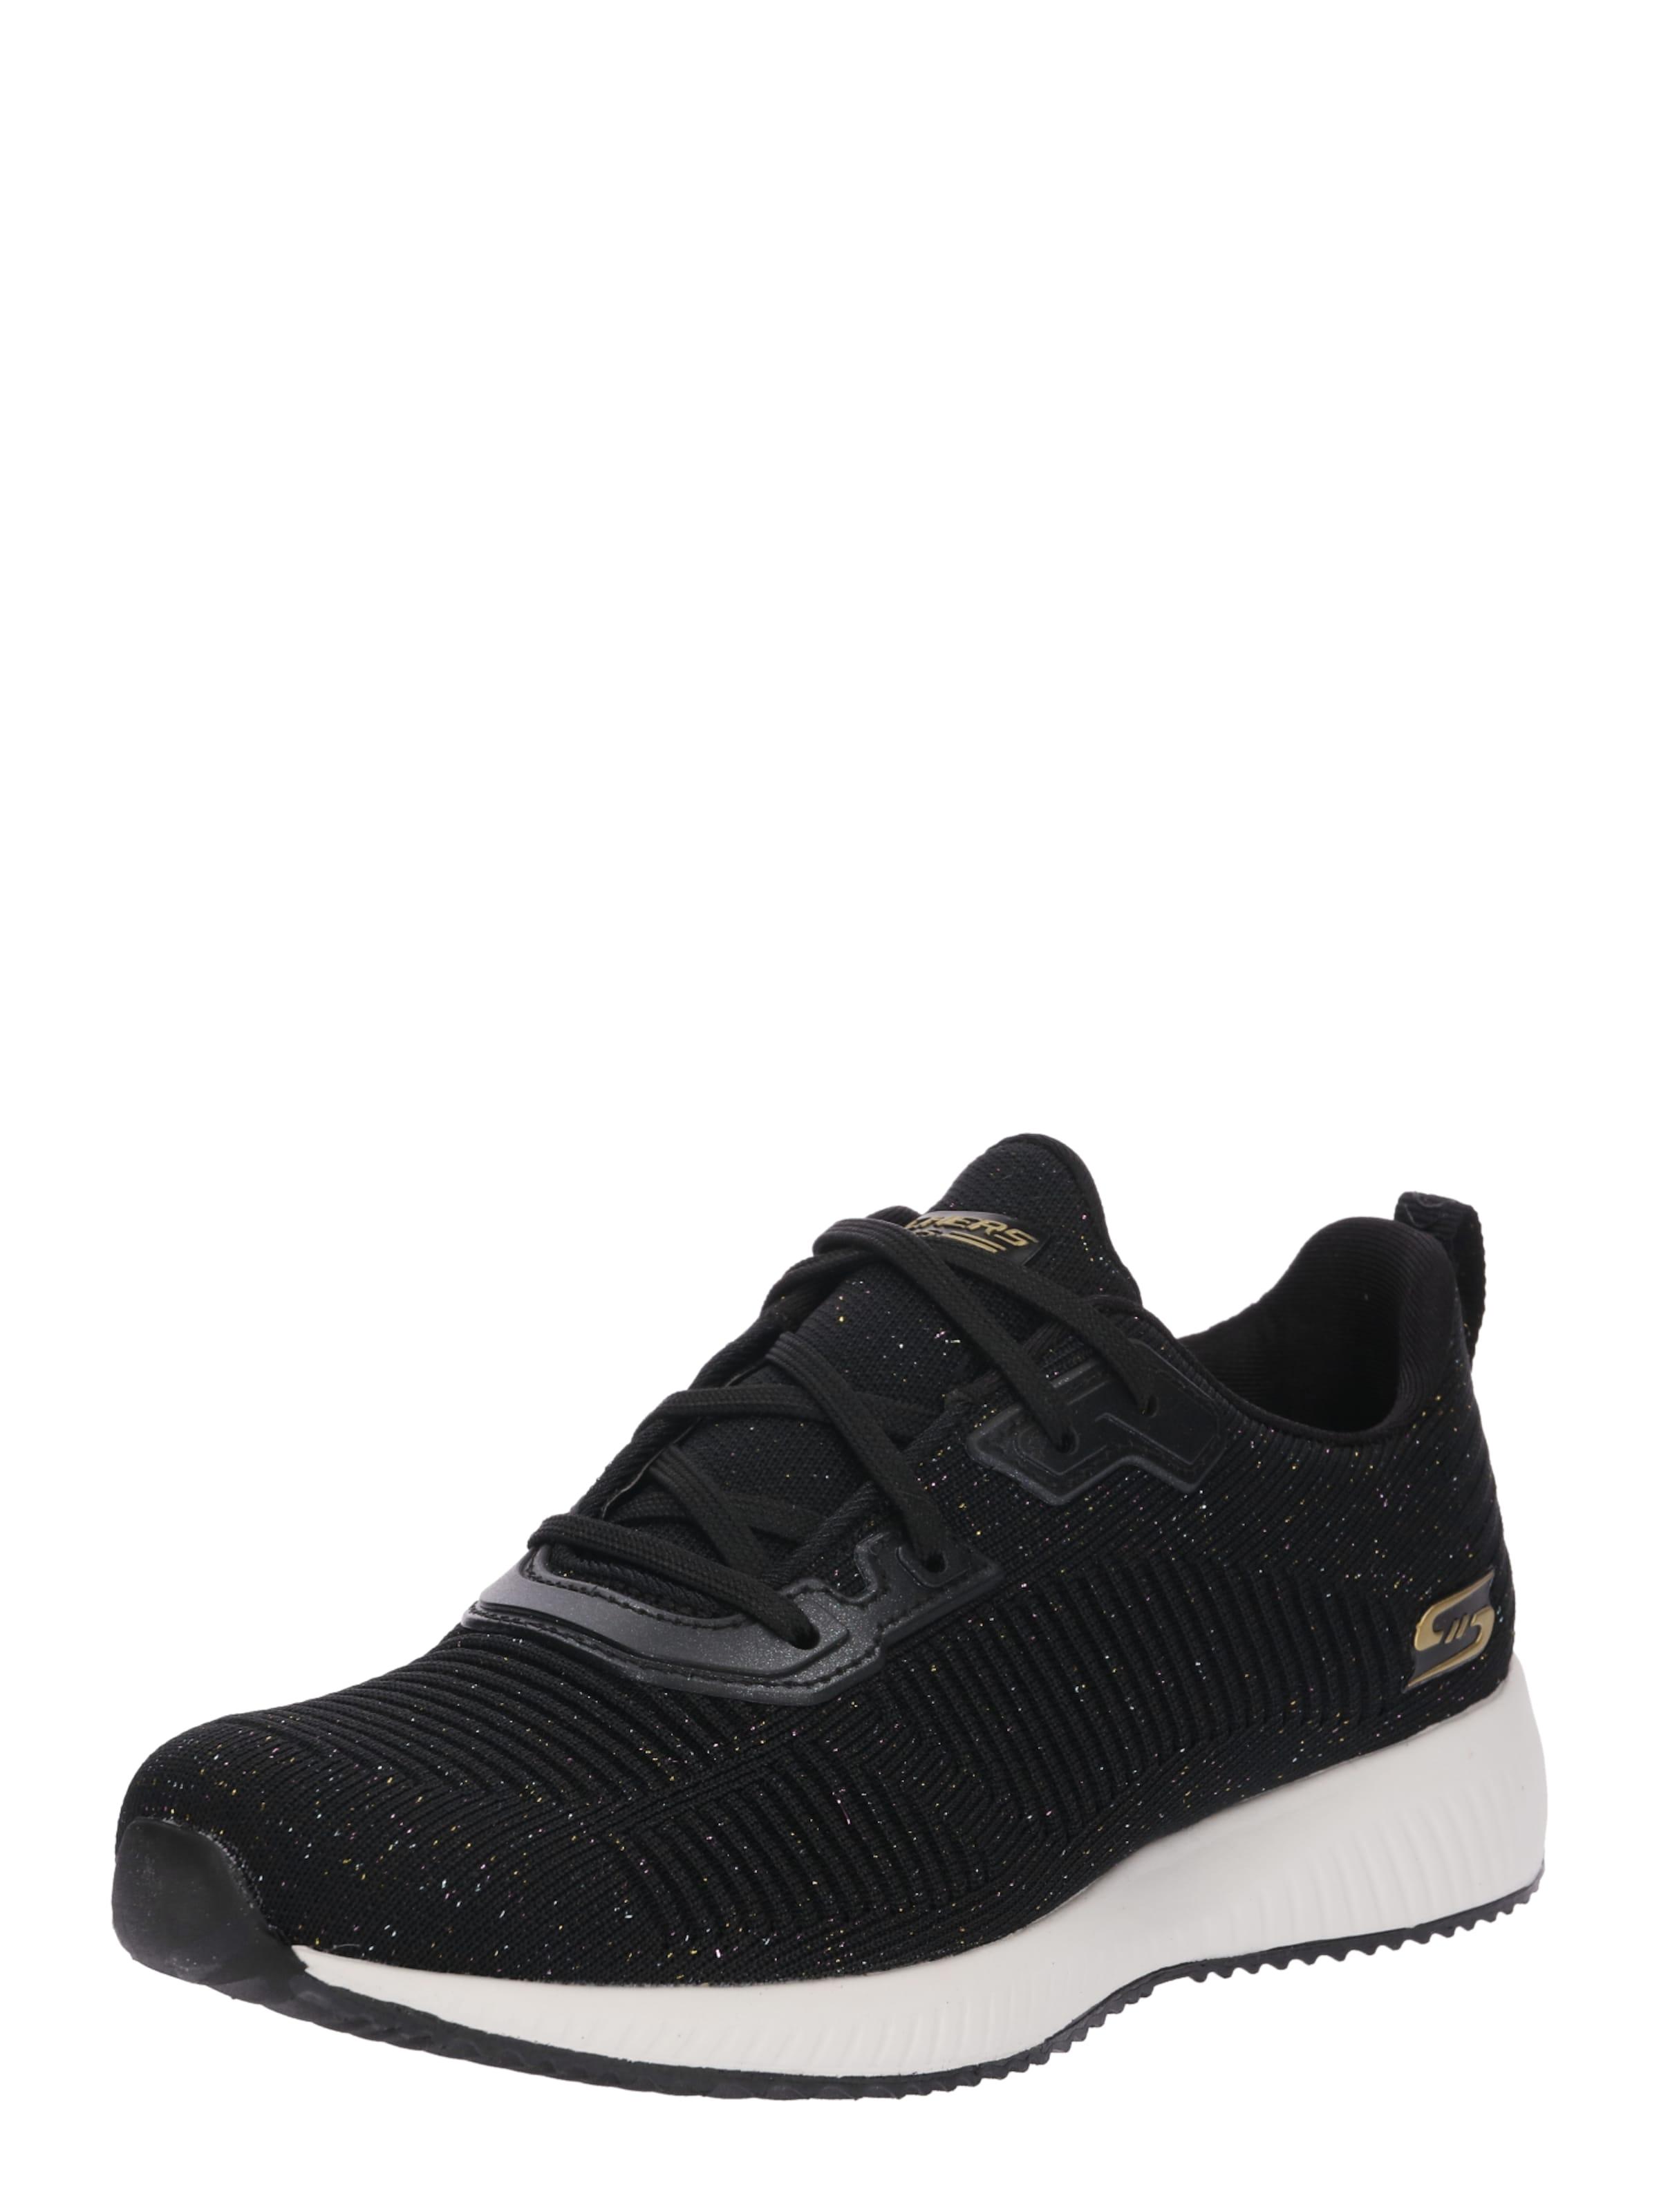 SKECHERS Sneaker BOBS SQUAD Verschleißfeste billige Schuhe